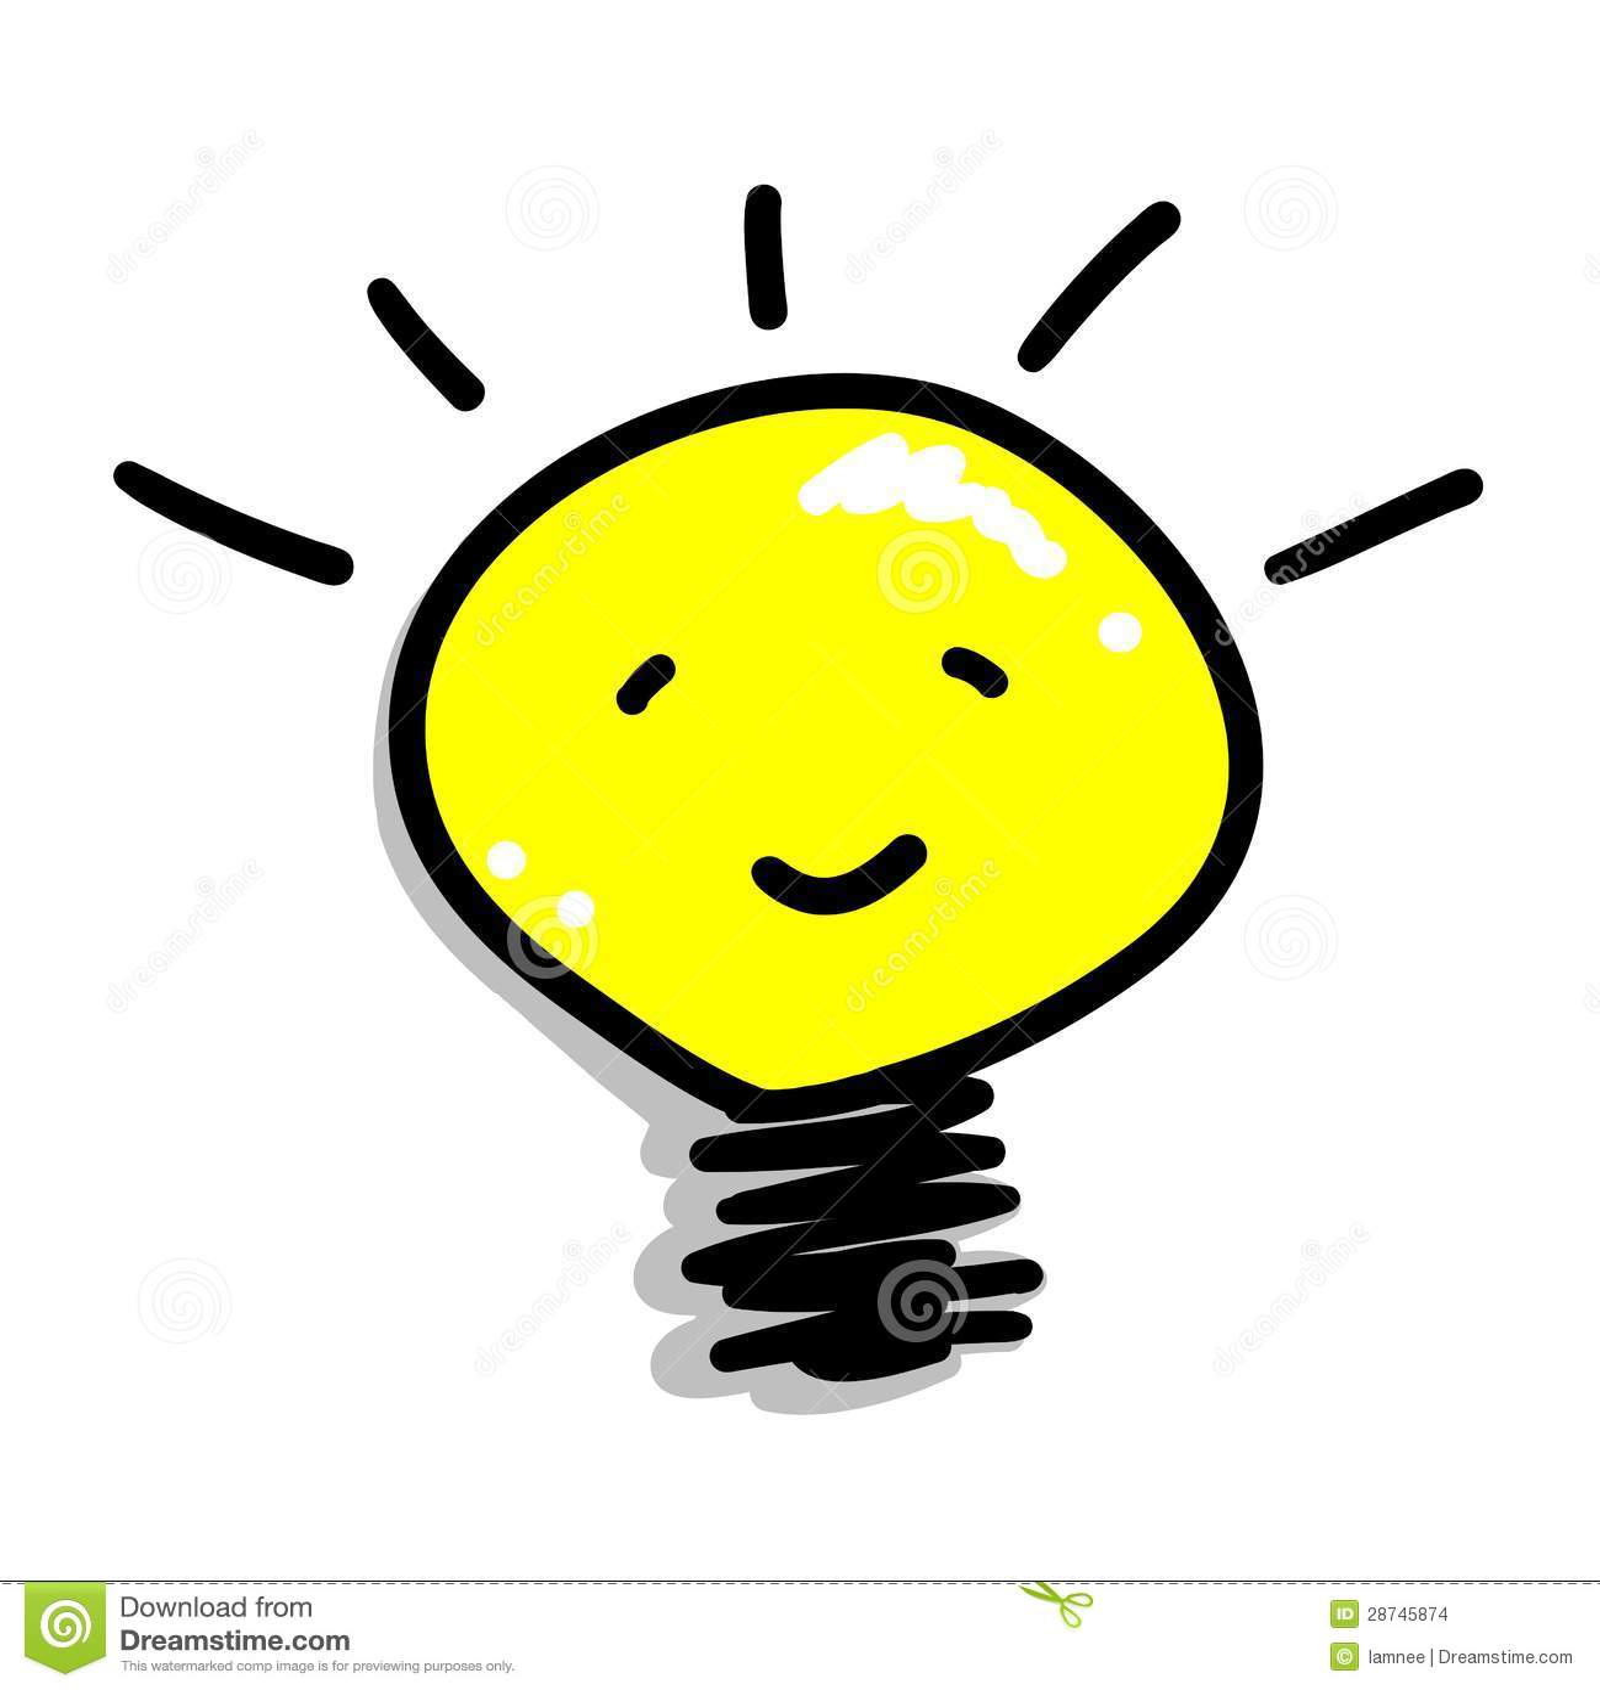 Cartoon Of A Smiling Light Bulb Icon Stock Vector - Illustration of ... for Bright Idea Light Bulb Png  83fiz